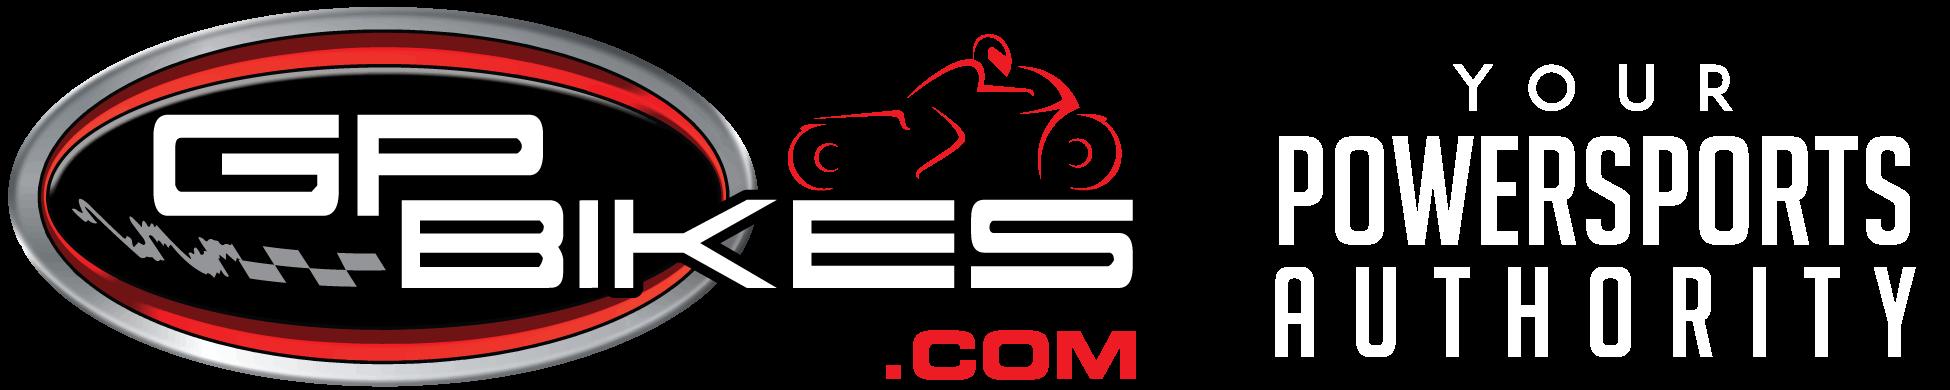 gpbikes.com - Your Powersports Authority